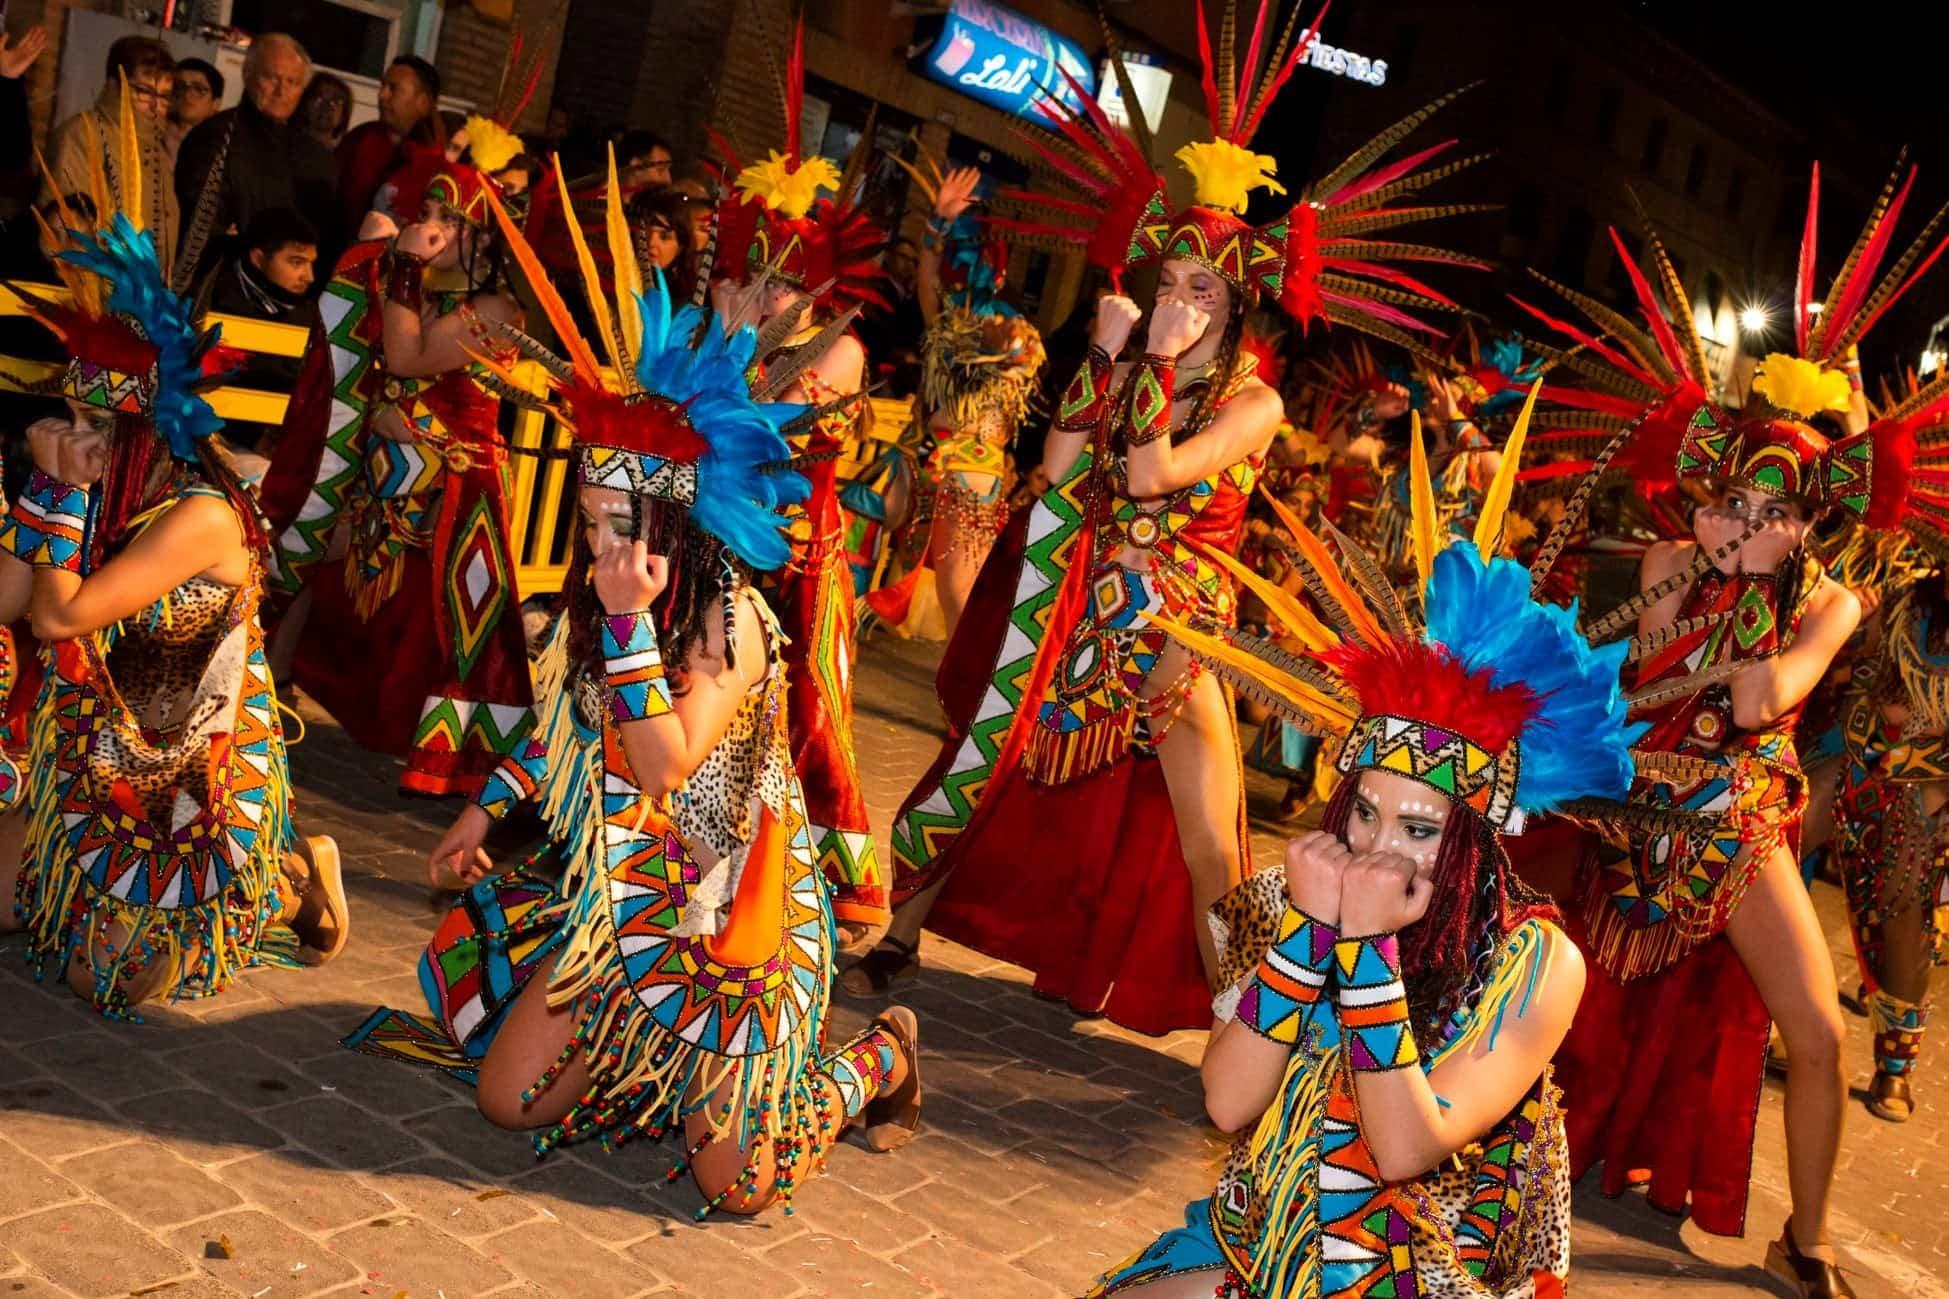 Carnaval de herencia 2020 ofertorio 168 - Selección de fotografías del Ofertorio del Carnaval de Herencia